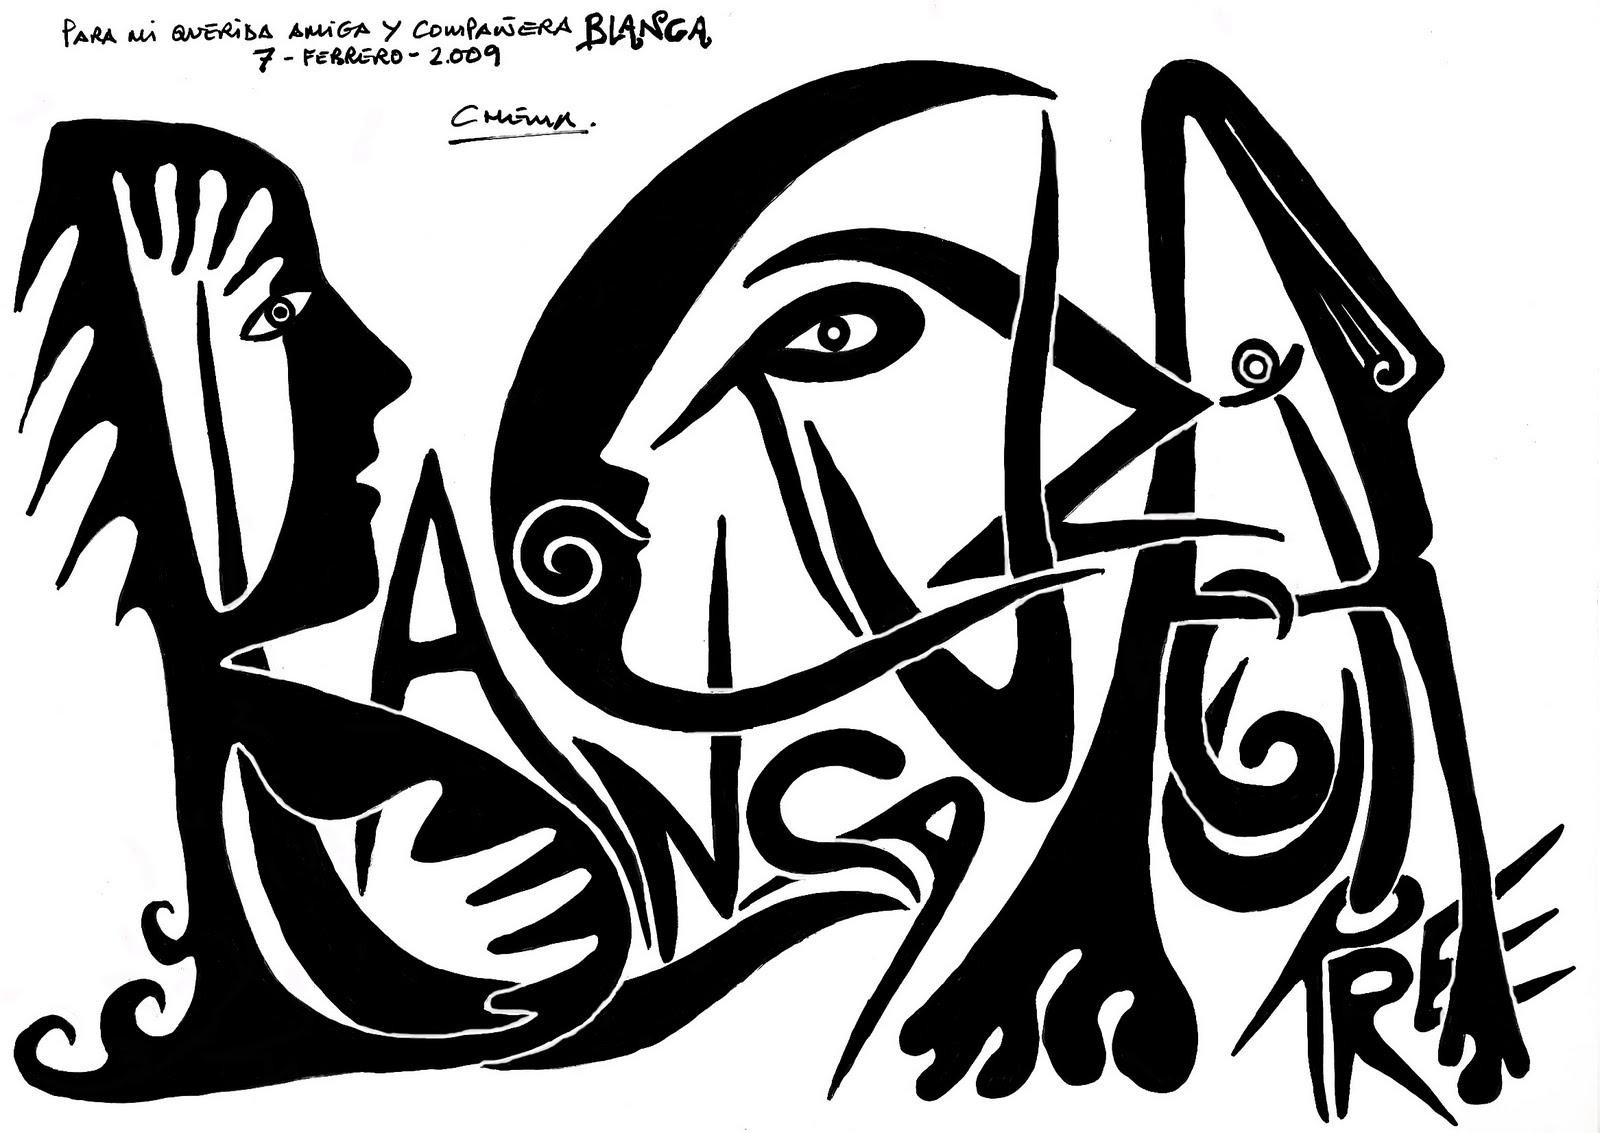 Dibujos De Graffiti Chidos Para Colorear Dibujos Chidos Bocetos De